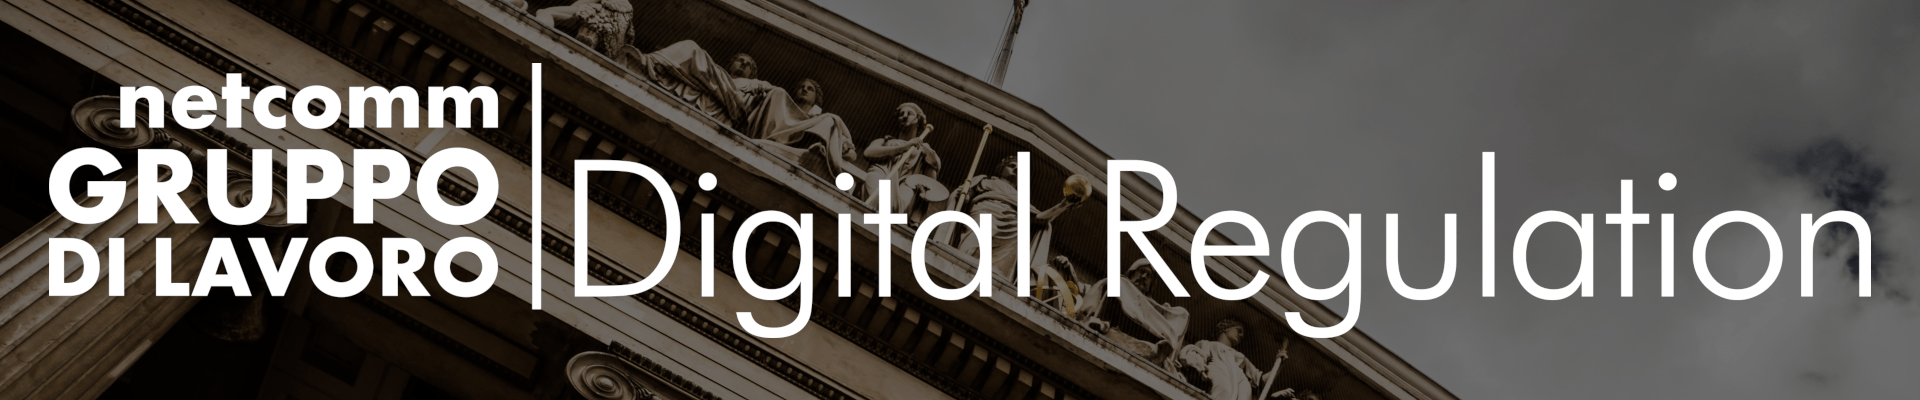 Netcomm Gruppo di Lavoro Digital regulation